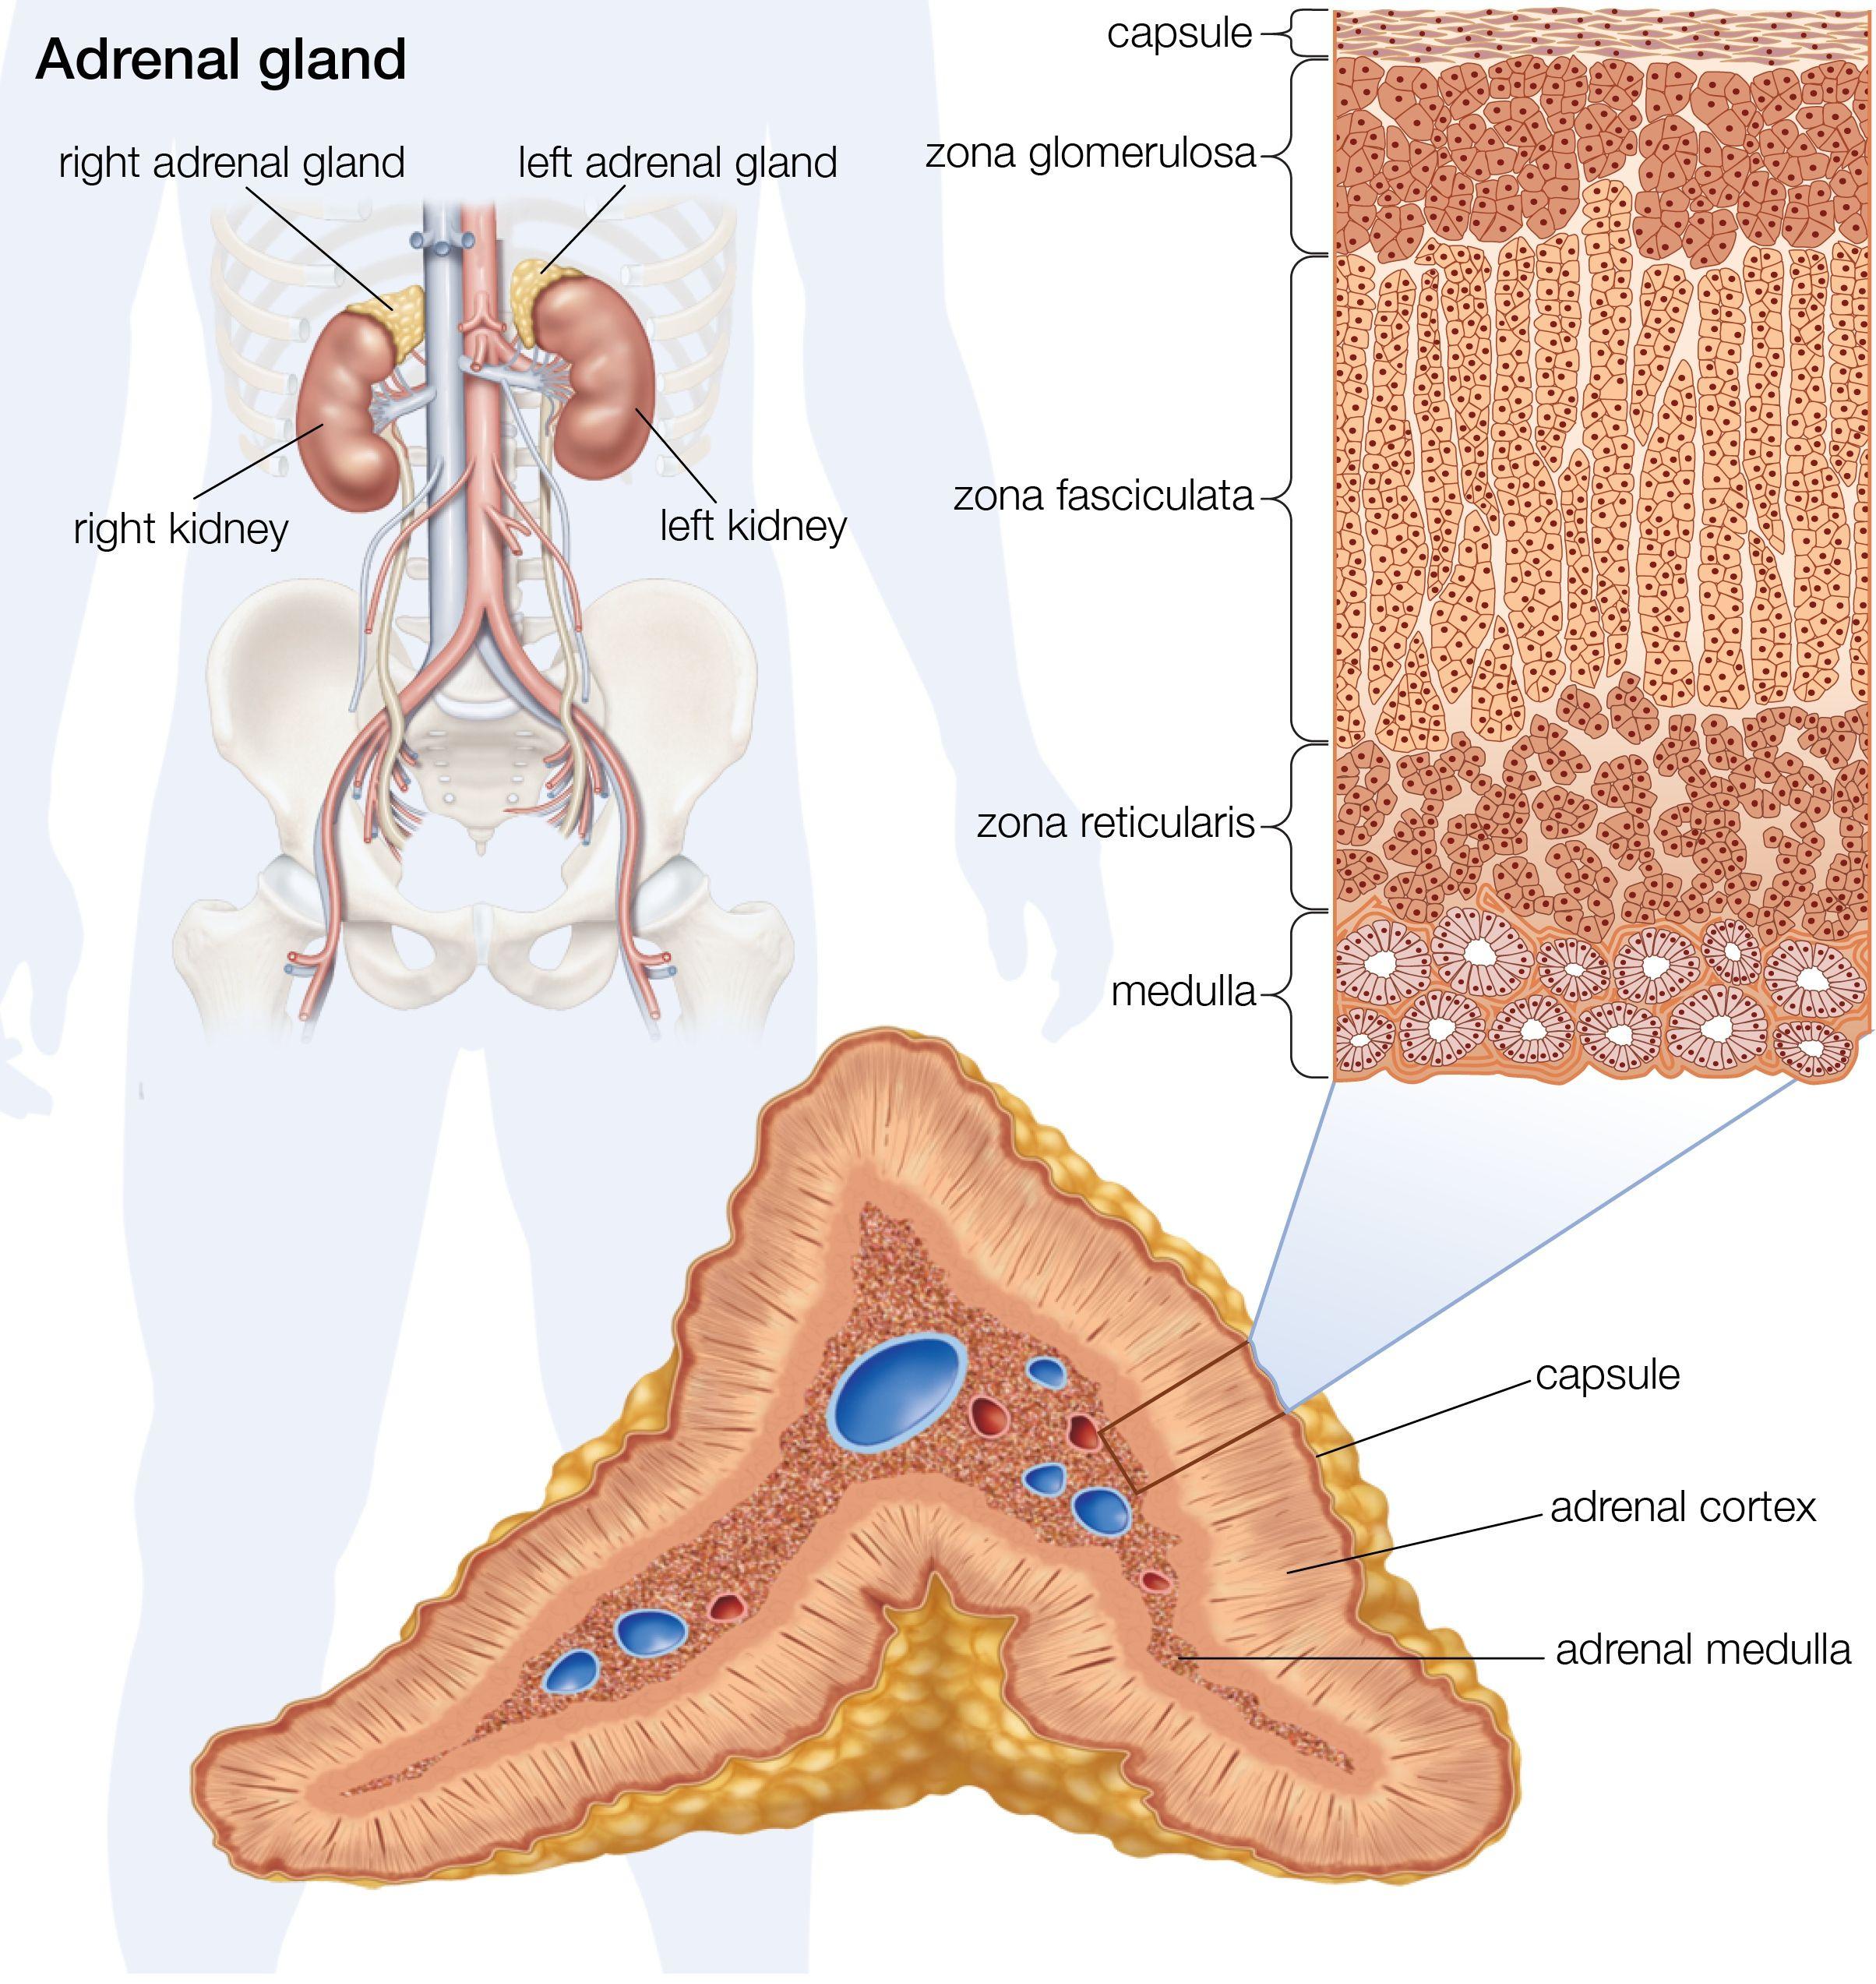 Adrenal Gland: Adrenal Glands And The Endocrine System